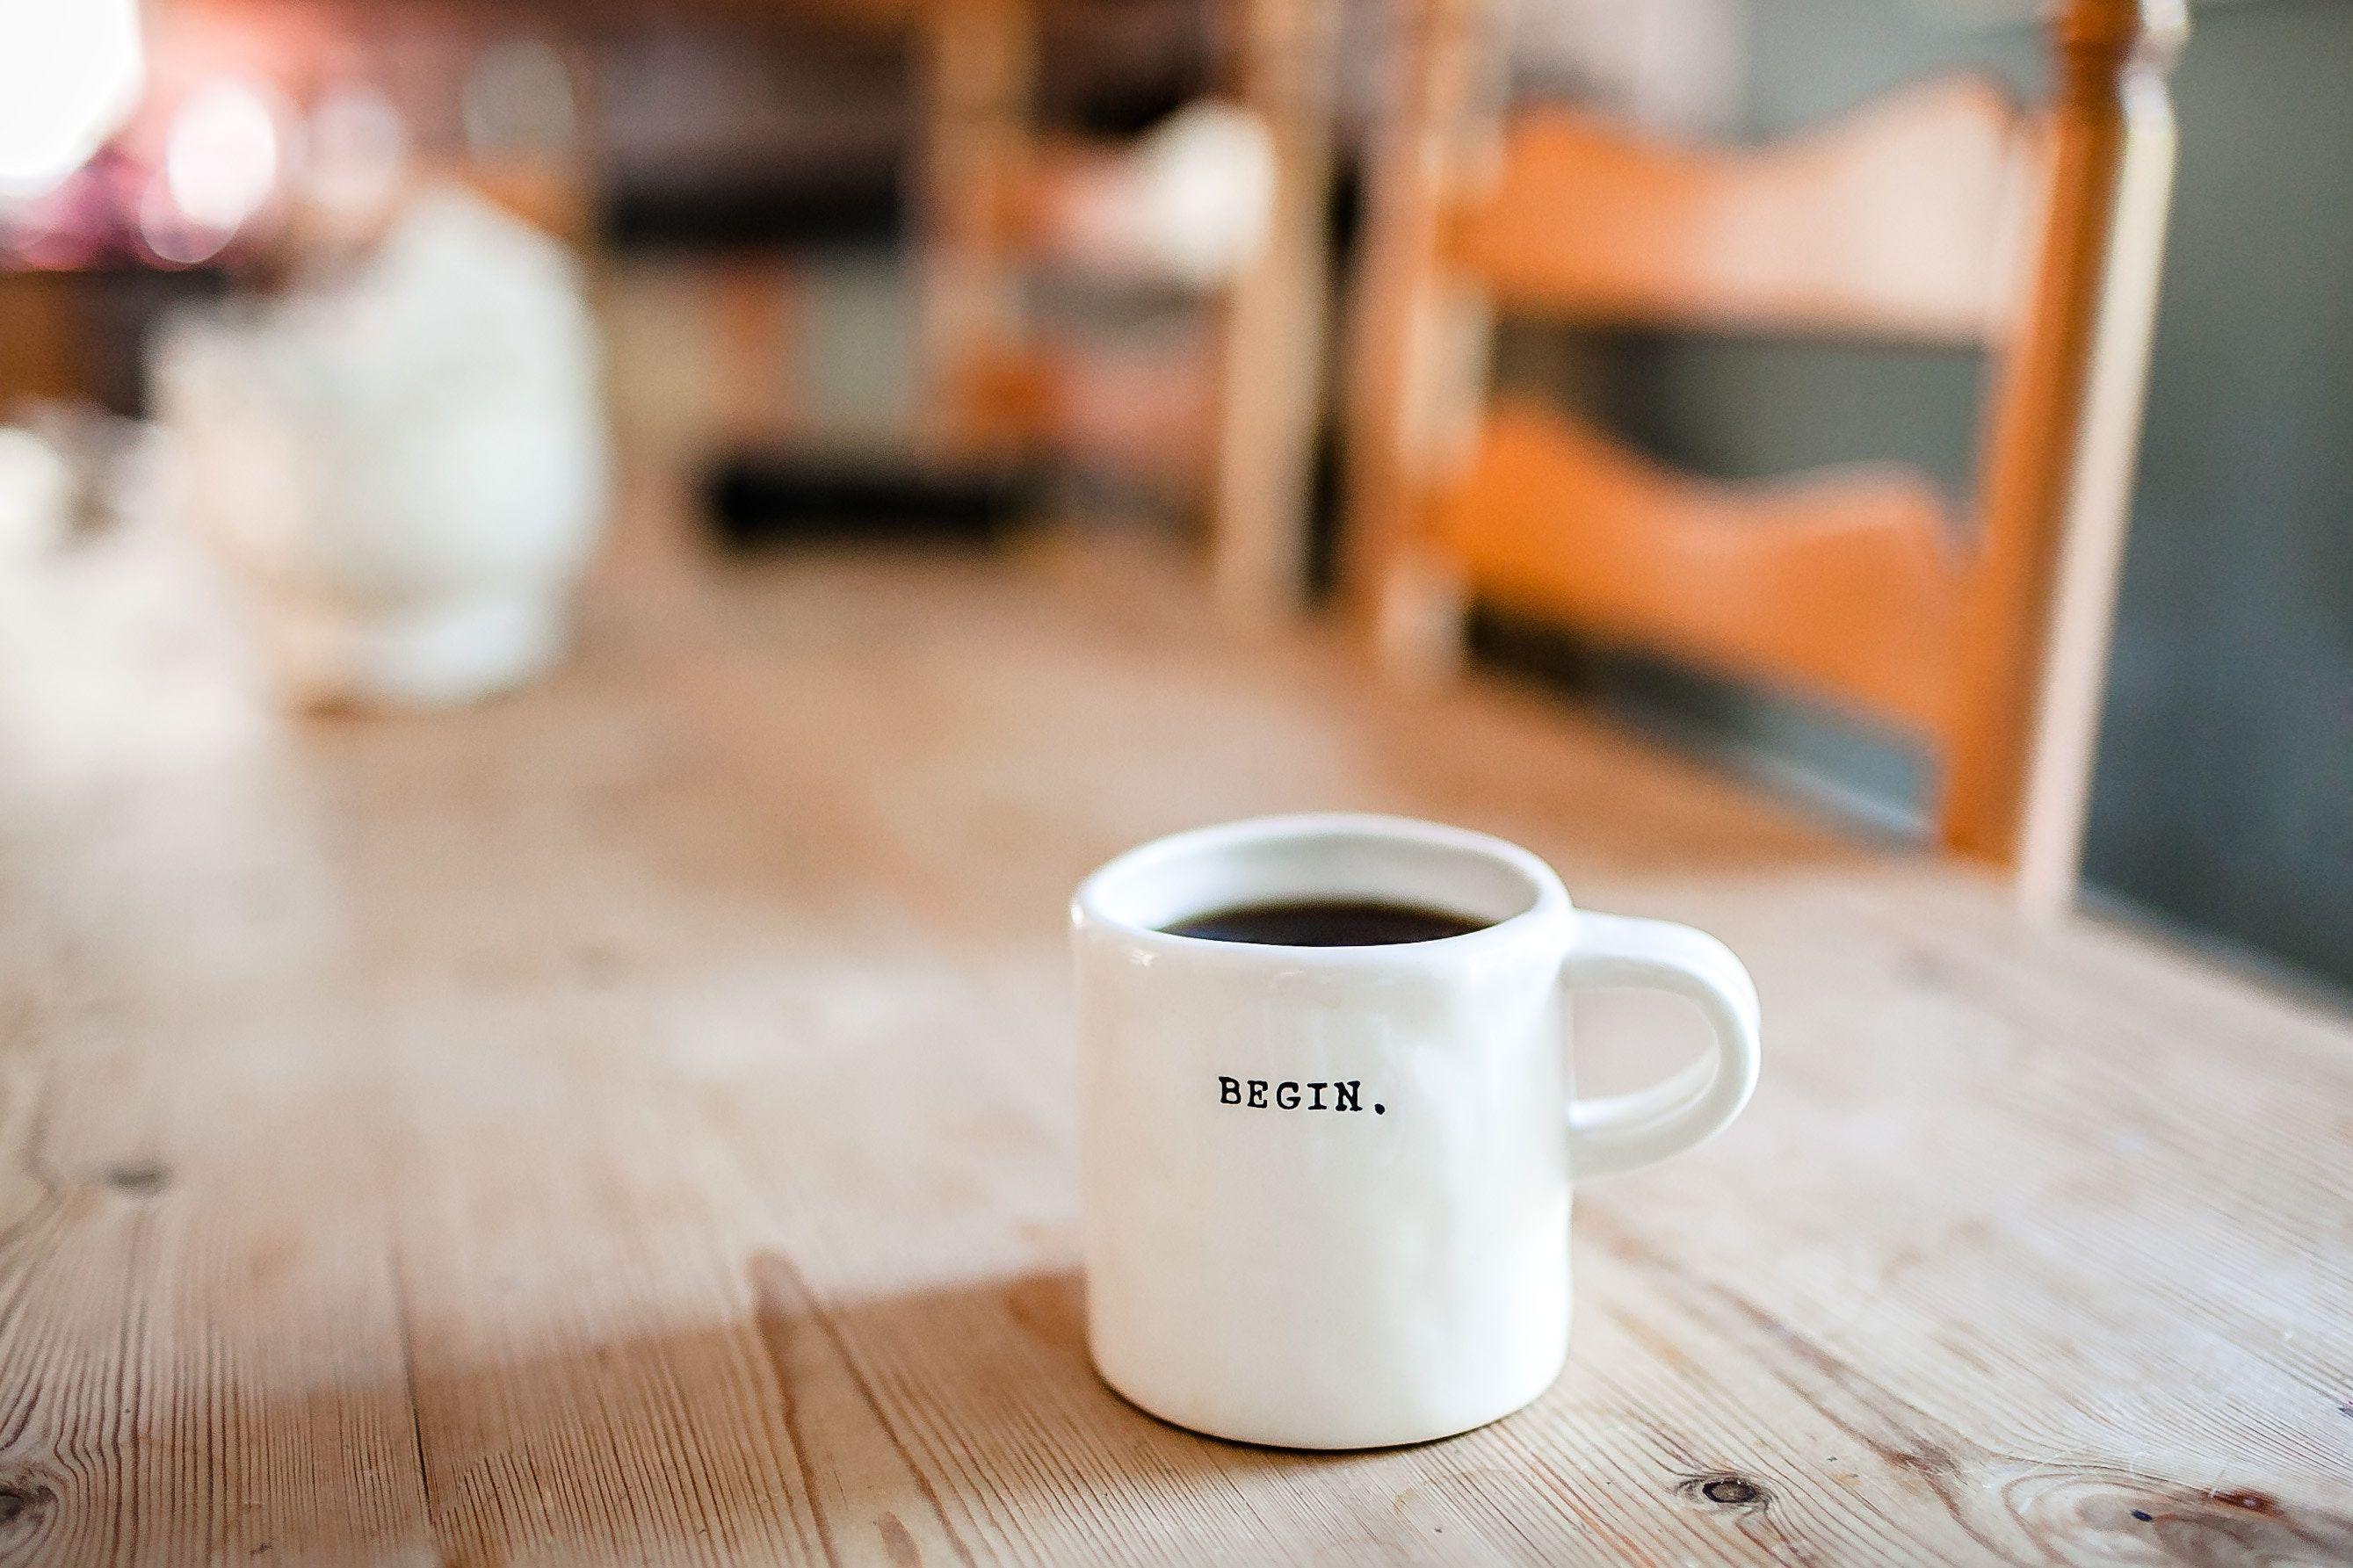 Mug on a kitchen table